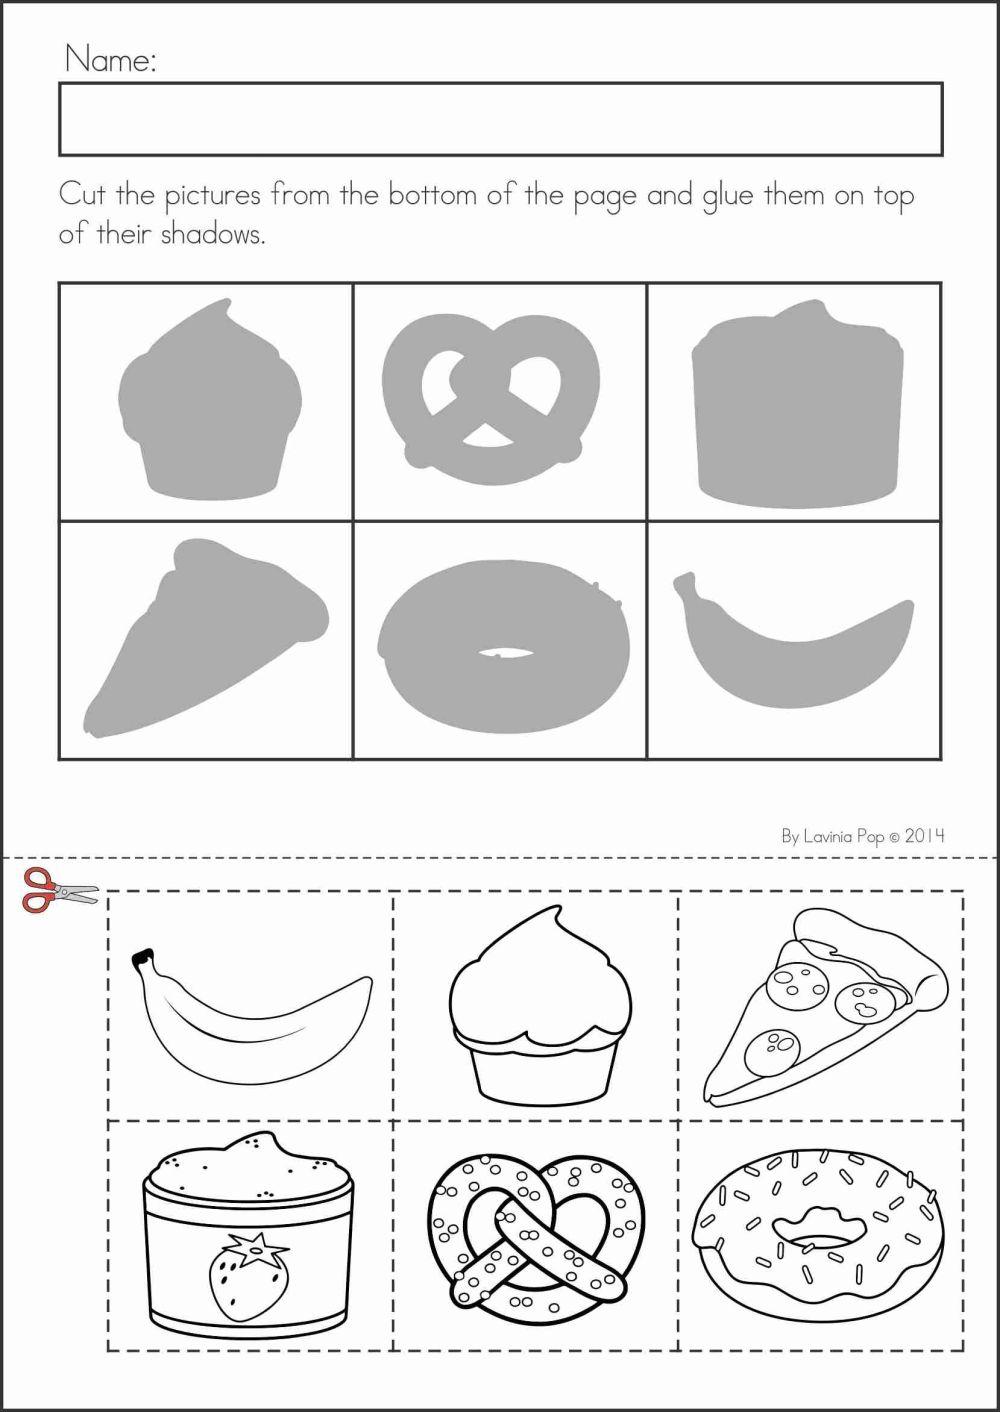 medium resolution of Preschool Matching Worksheet   Wkst   Kindergarten Worksheets on Best  Worksheets Collection 2644